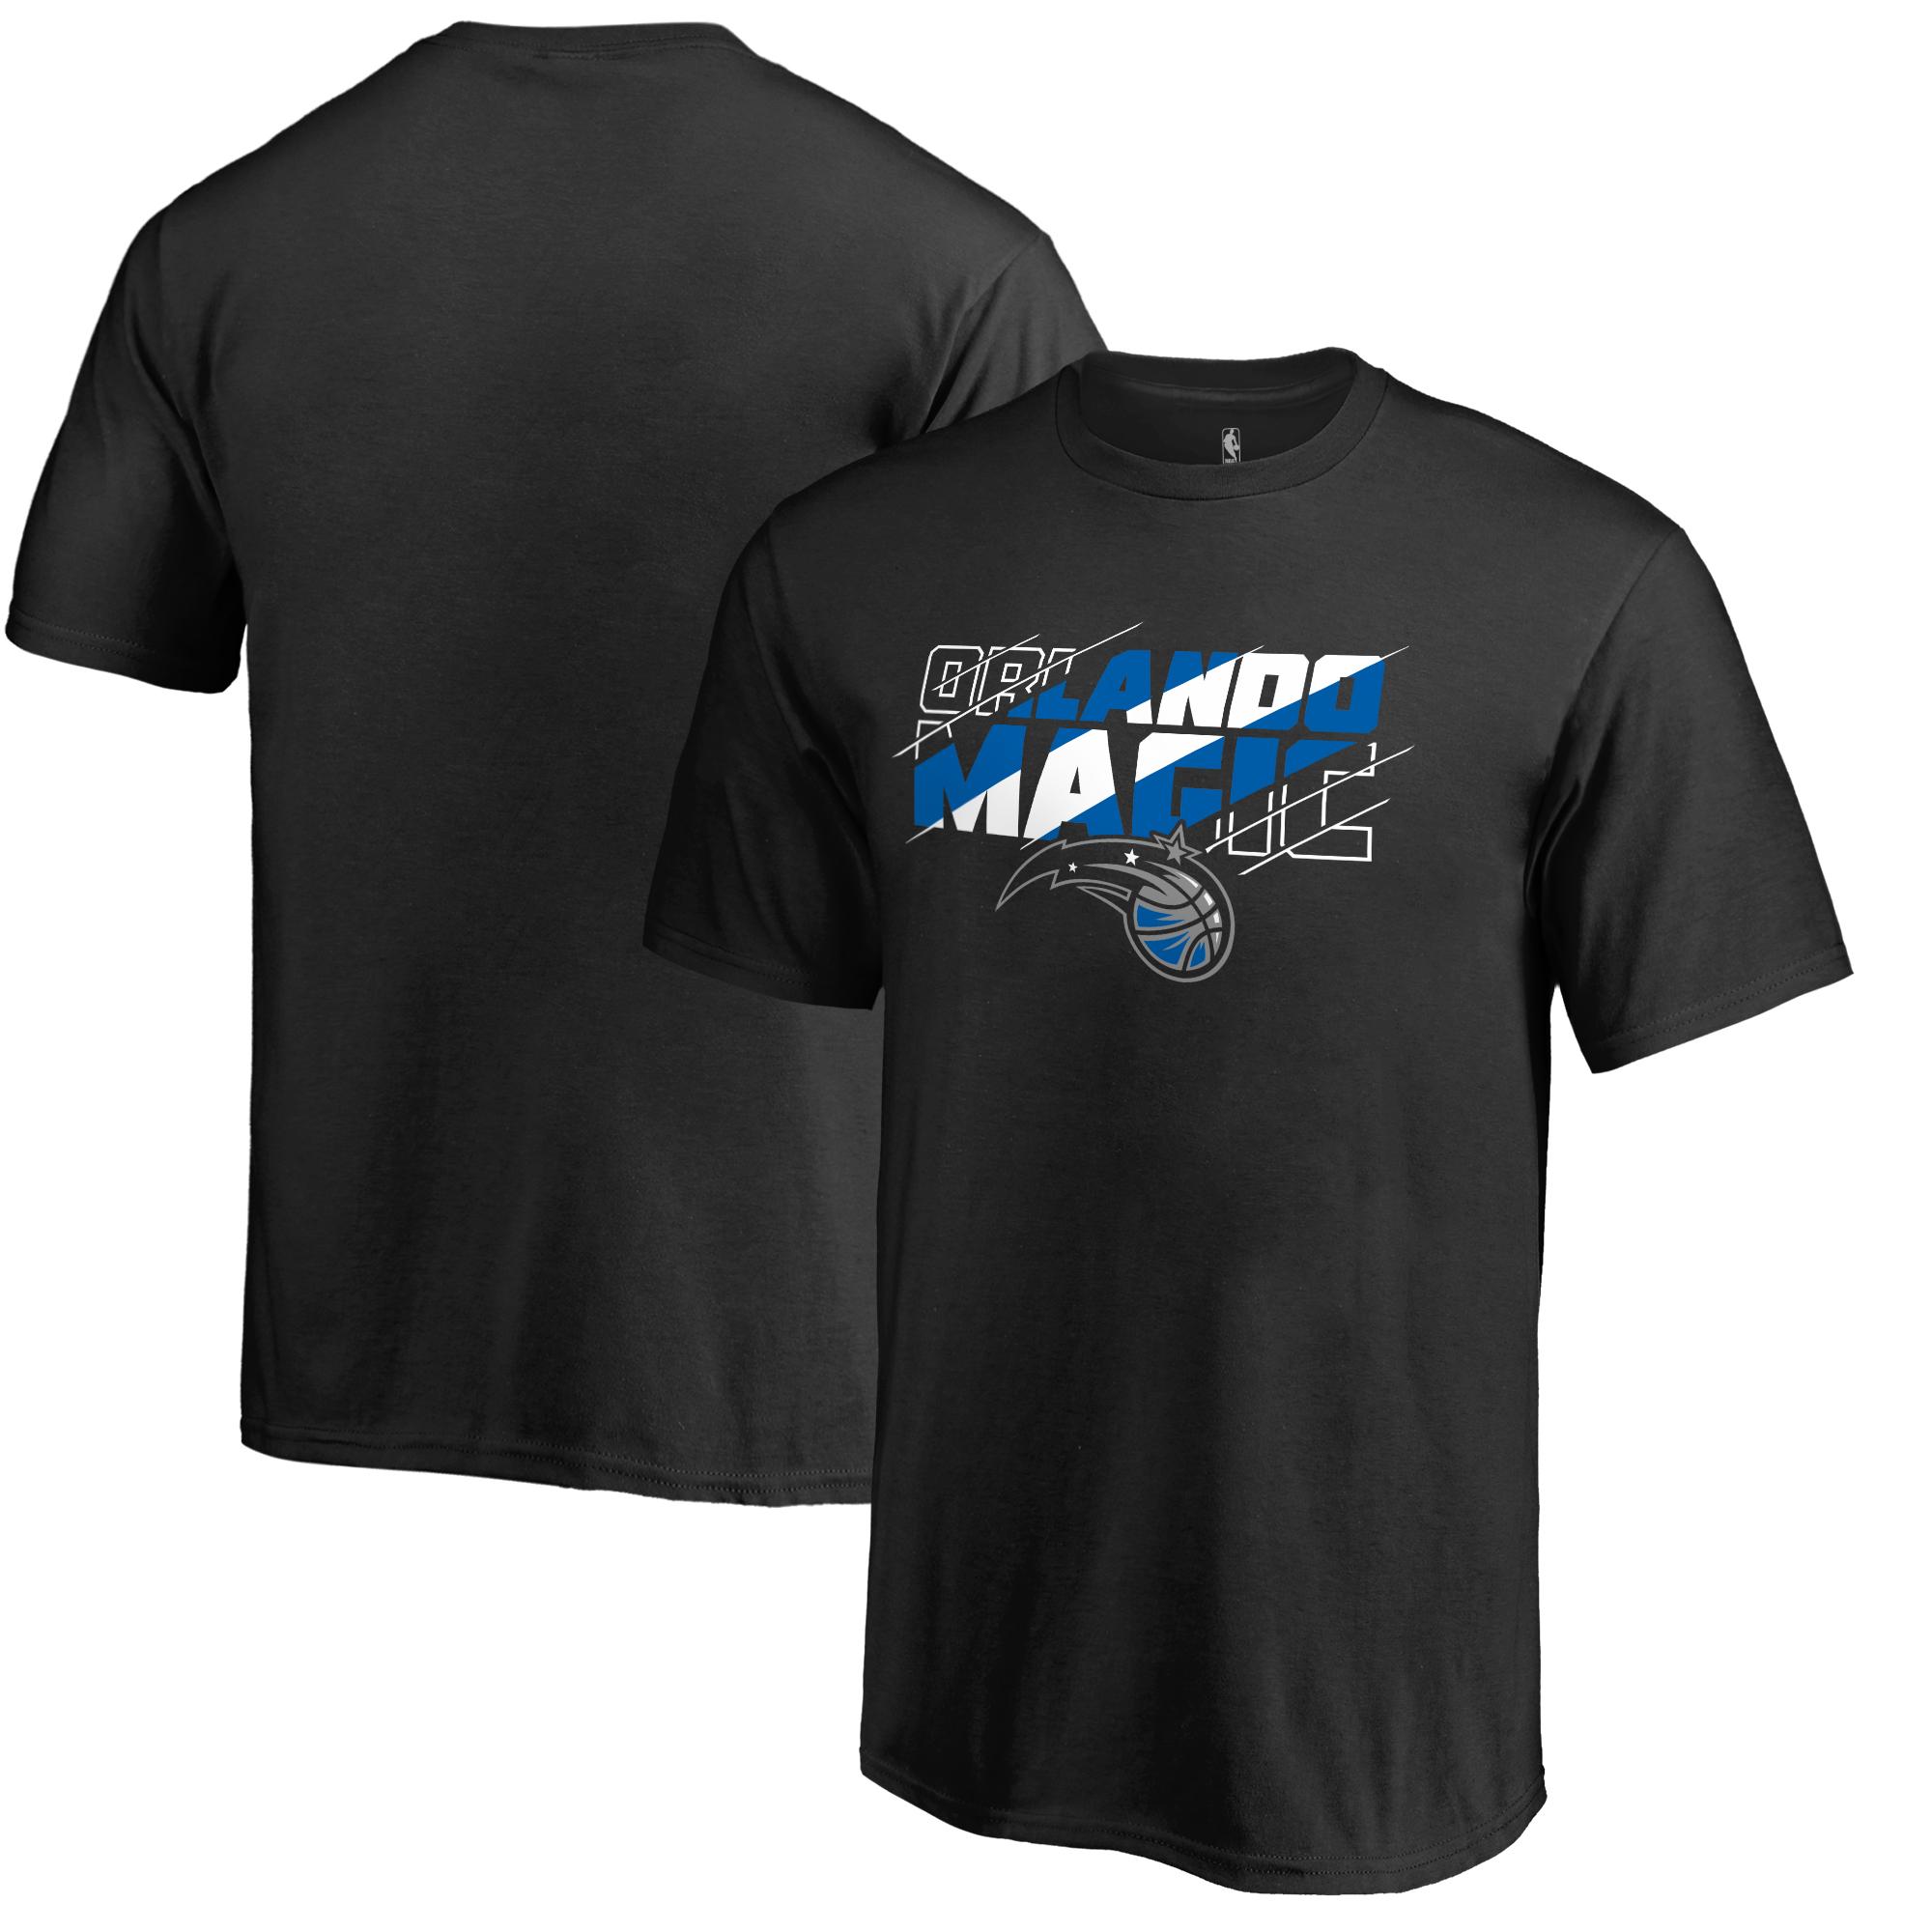 Orlando Magic Youth Stars Alternate Slasher T-Shirt - Black